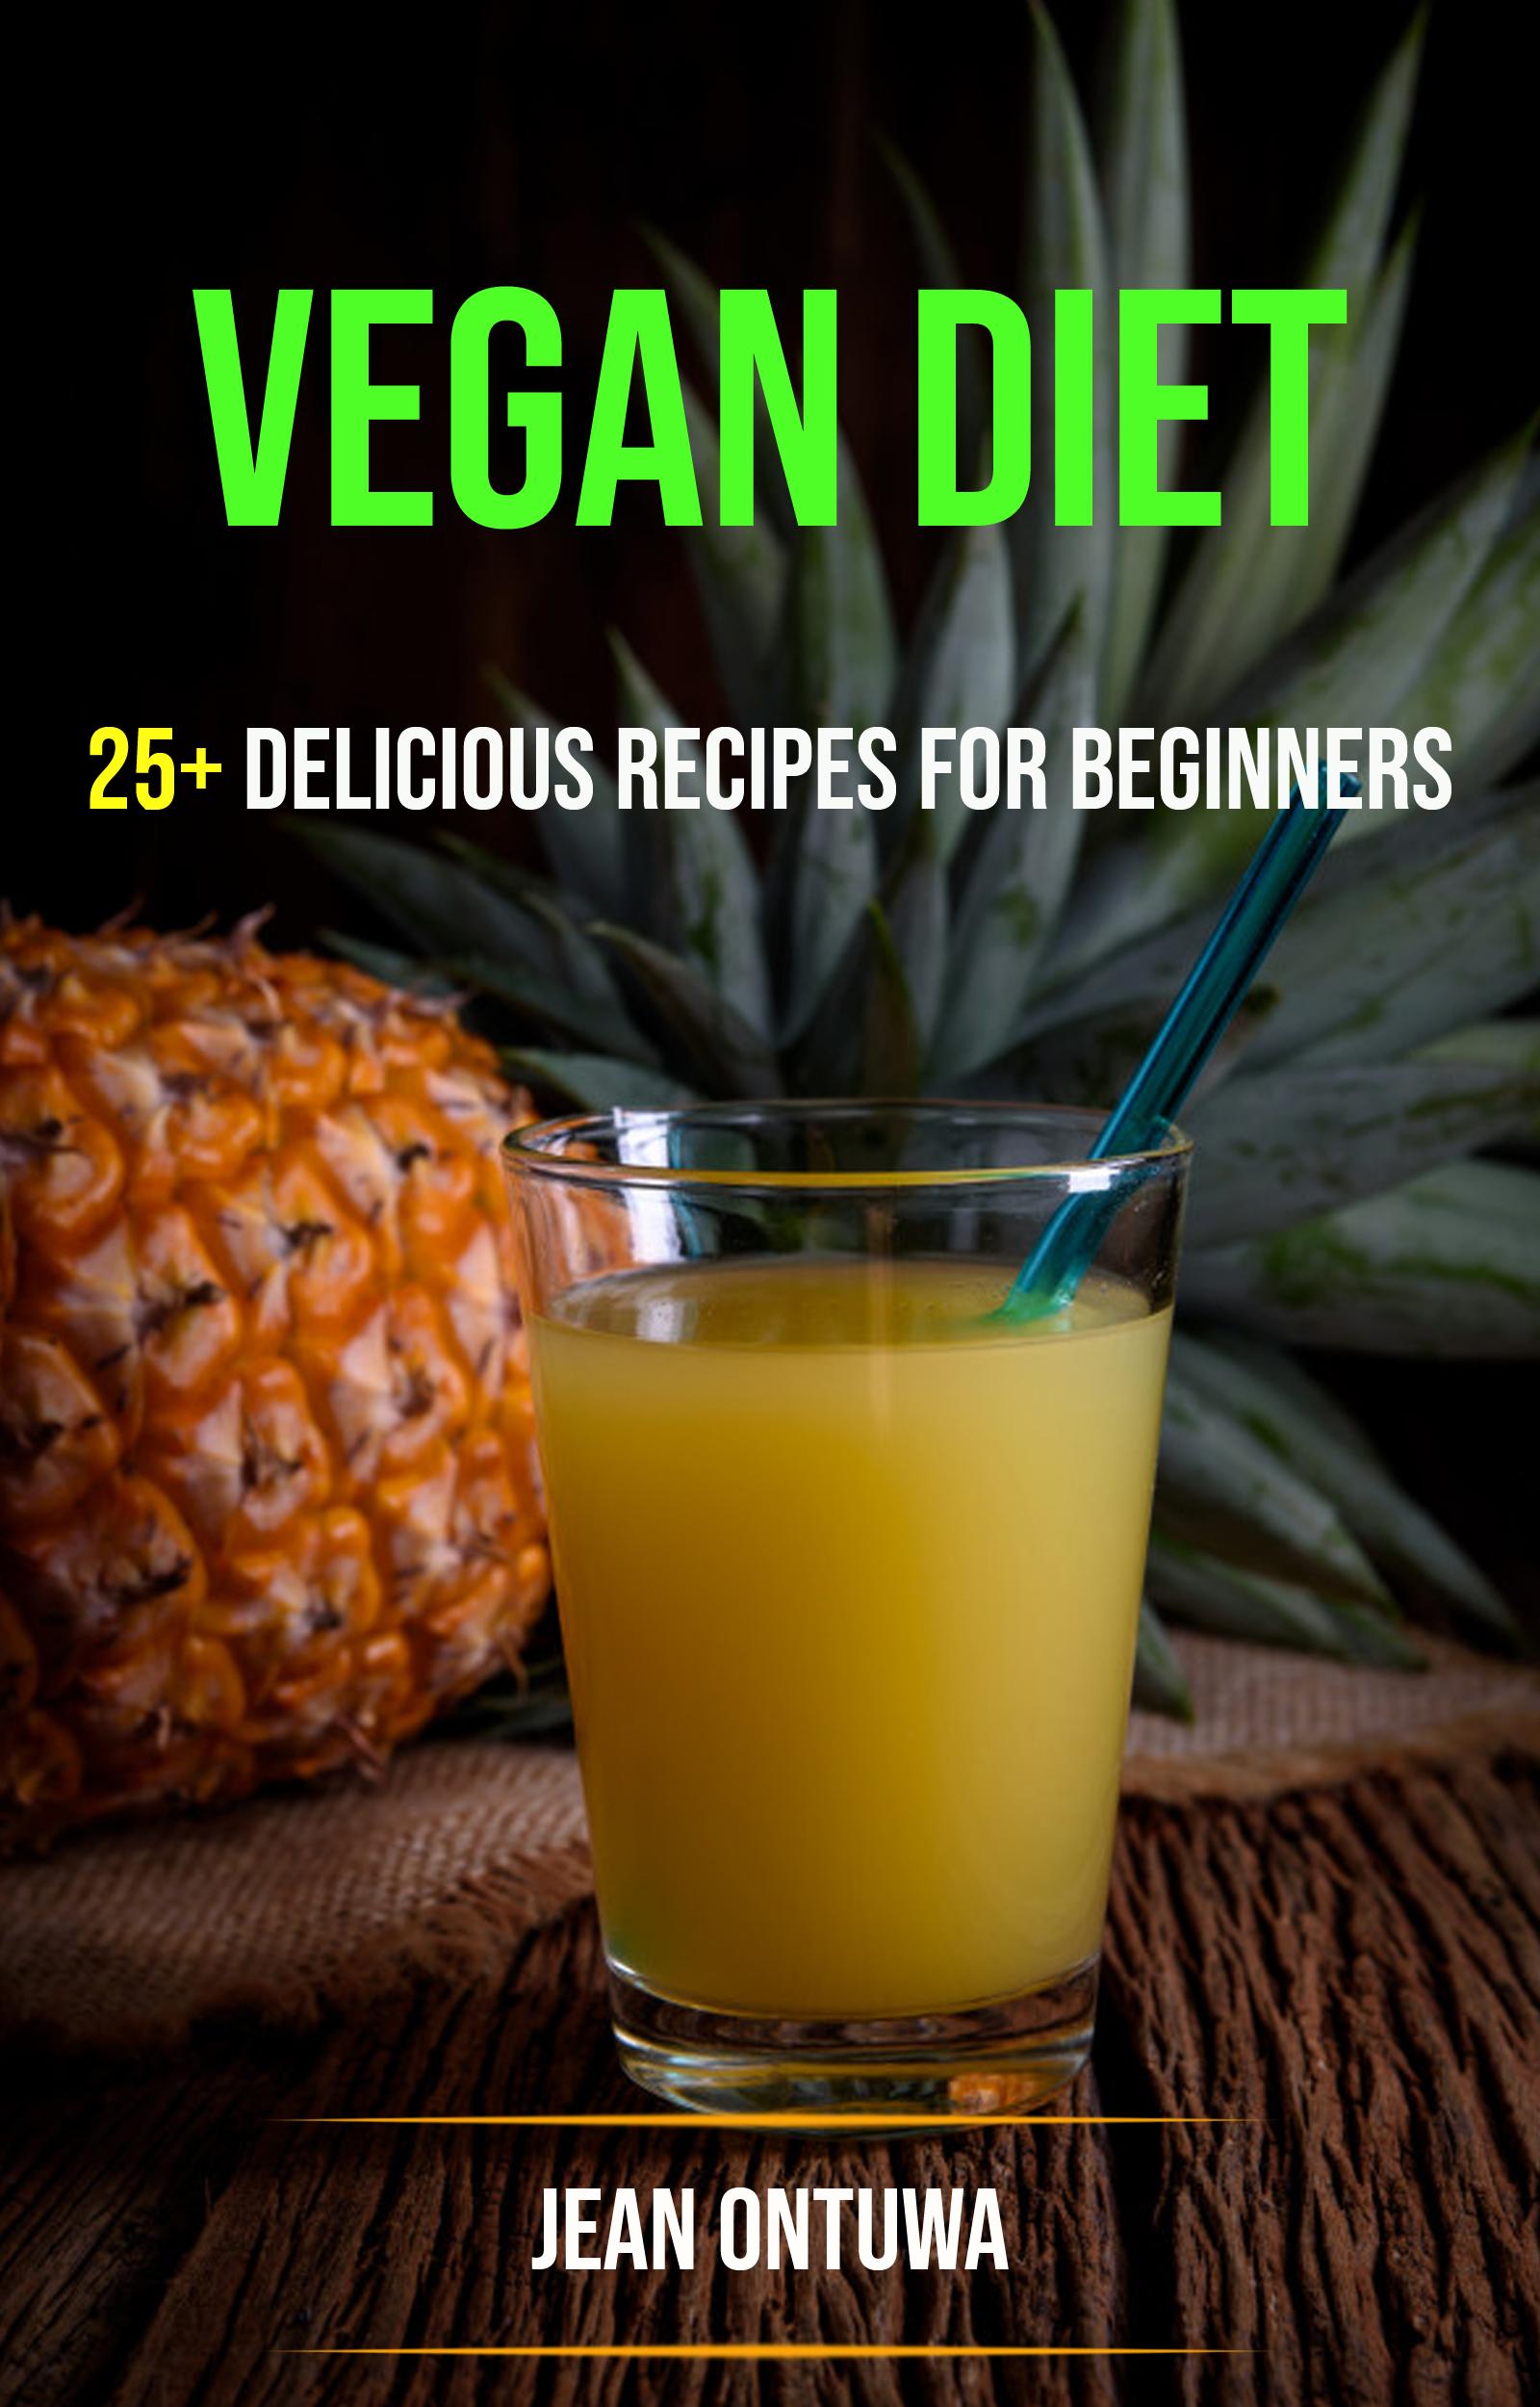 Vegan diet: 25+ delicious recipes for beginners